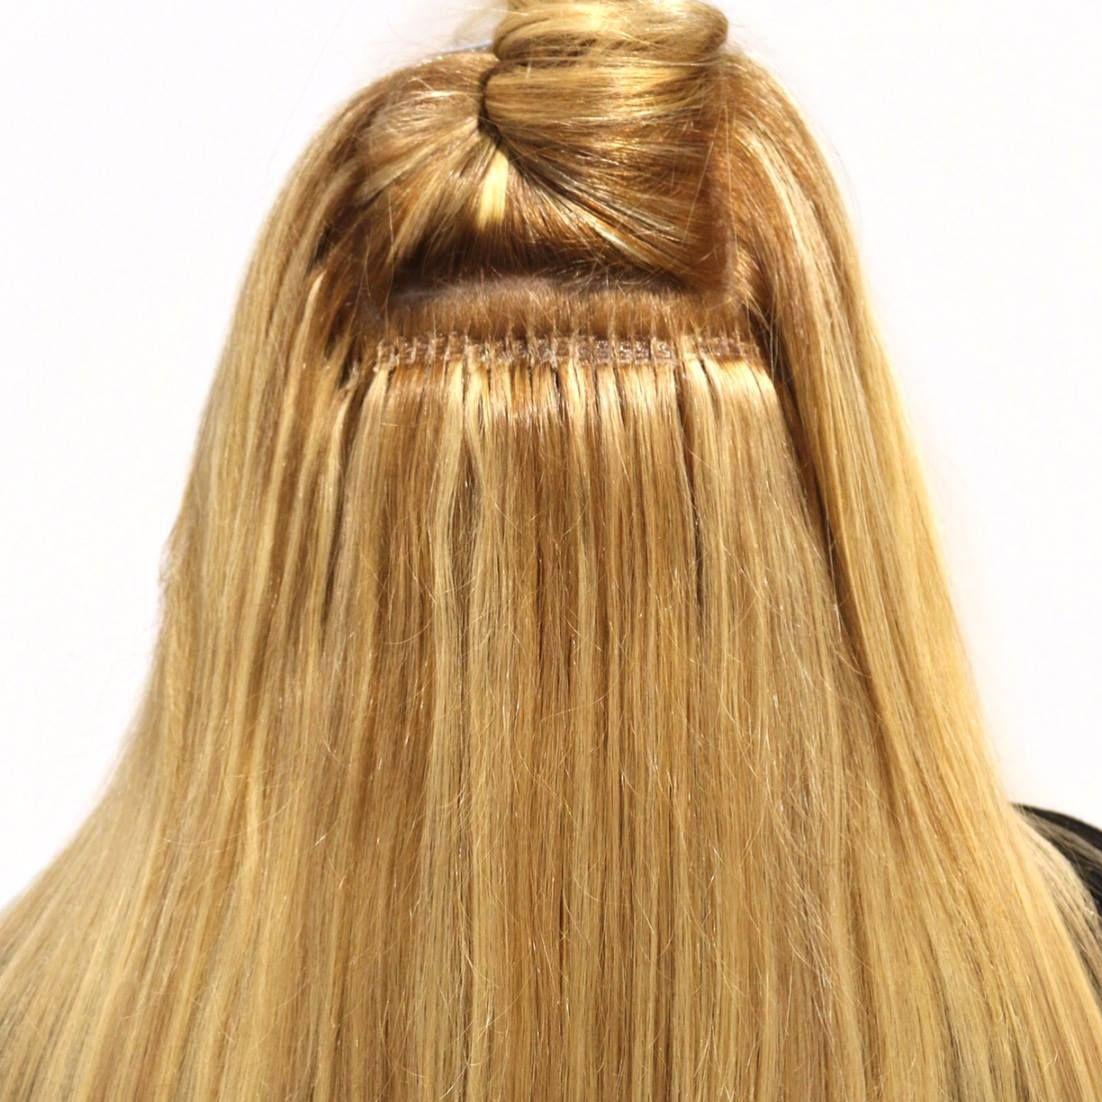 Hairdreams Laserbeamer Nano Extensions Bonds Blonde